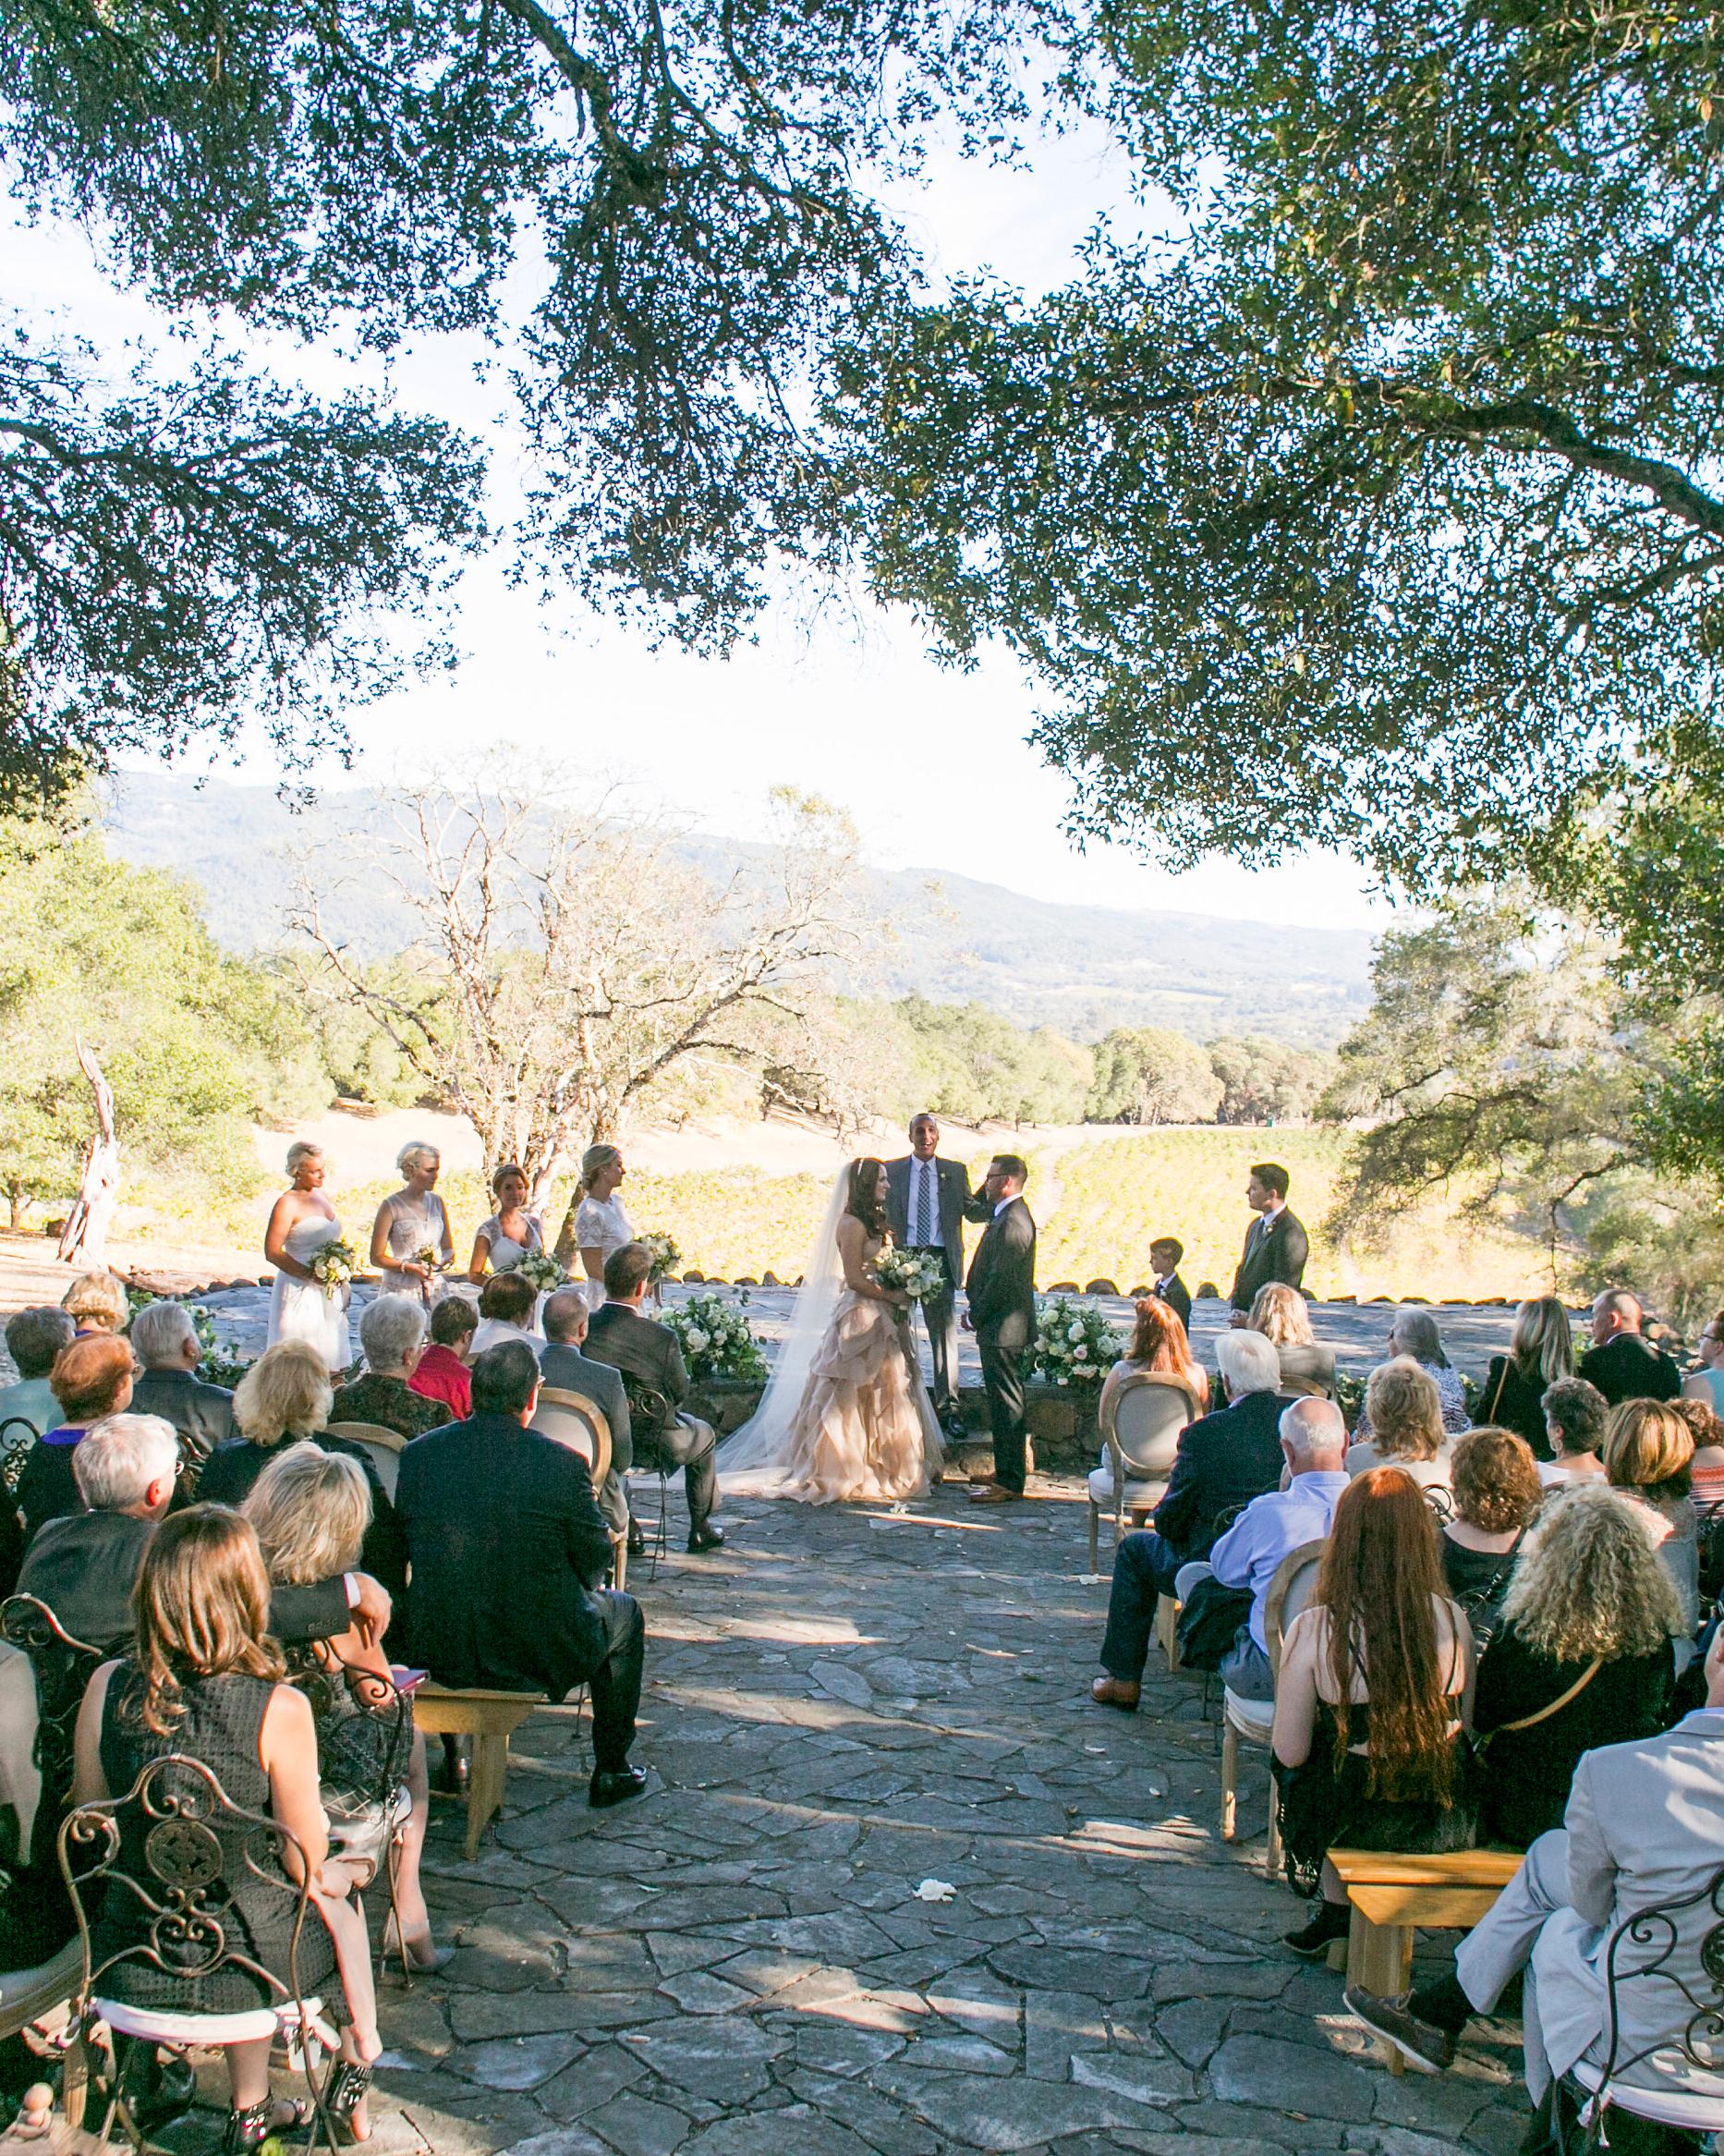 briana-adam-wedding-ceremony-0744-s112471-1215.jpg